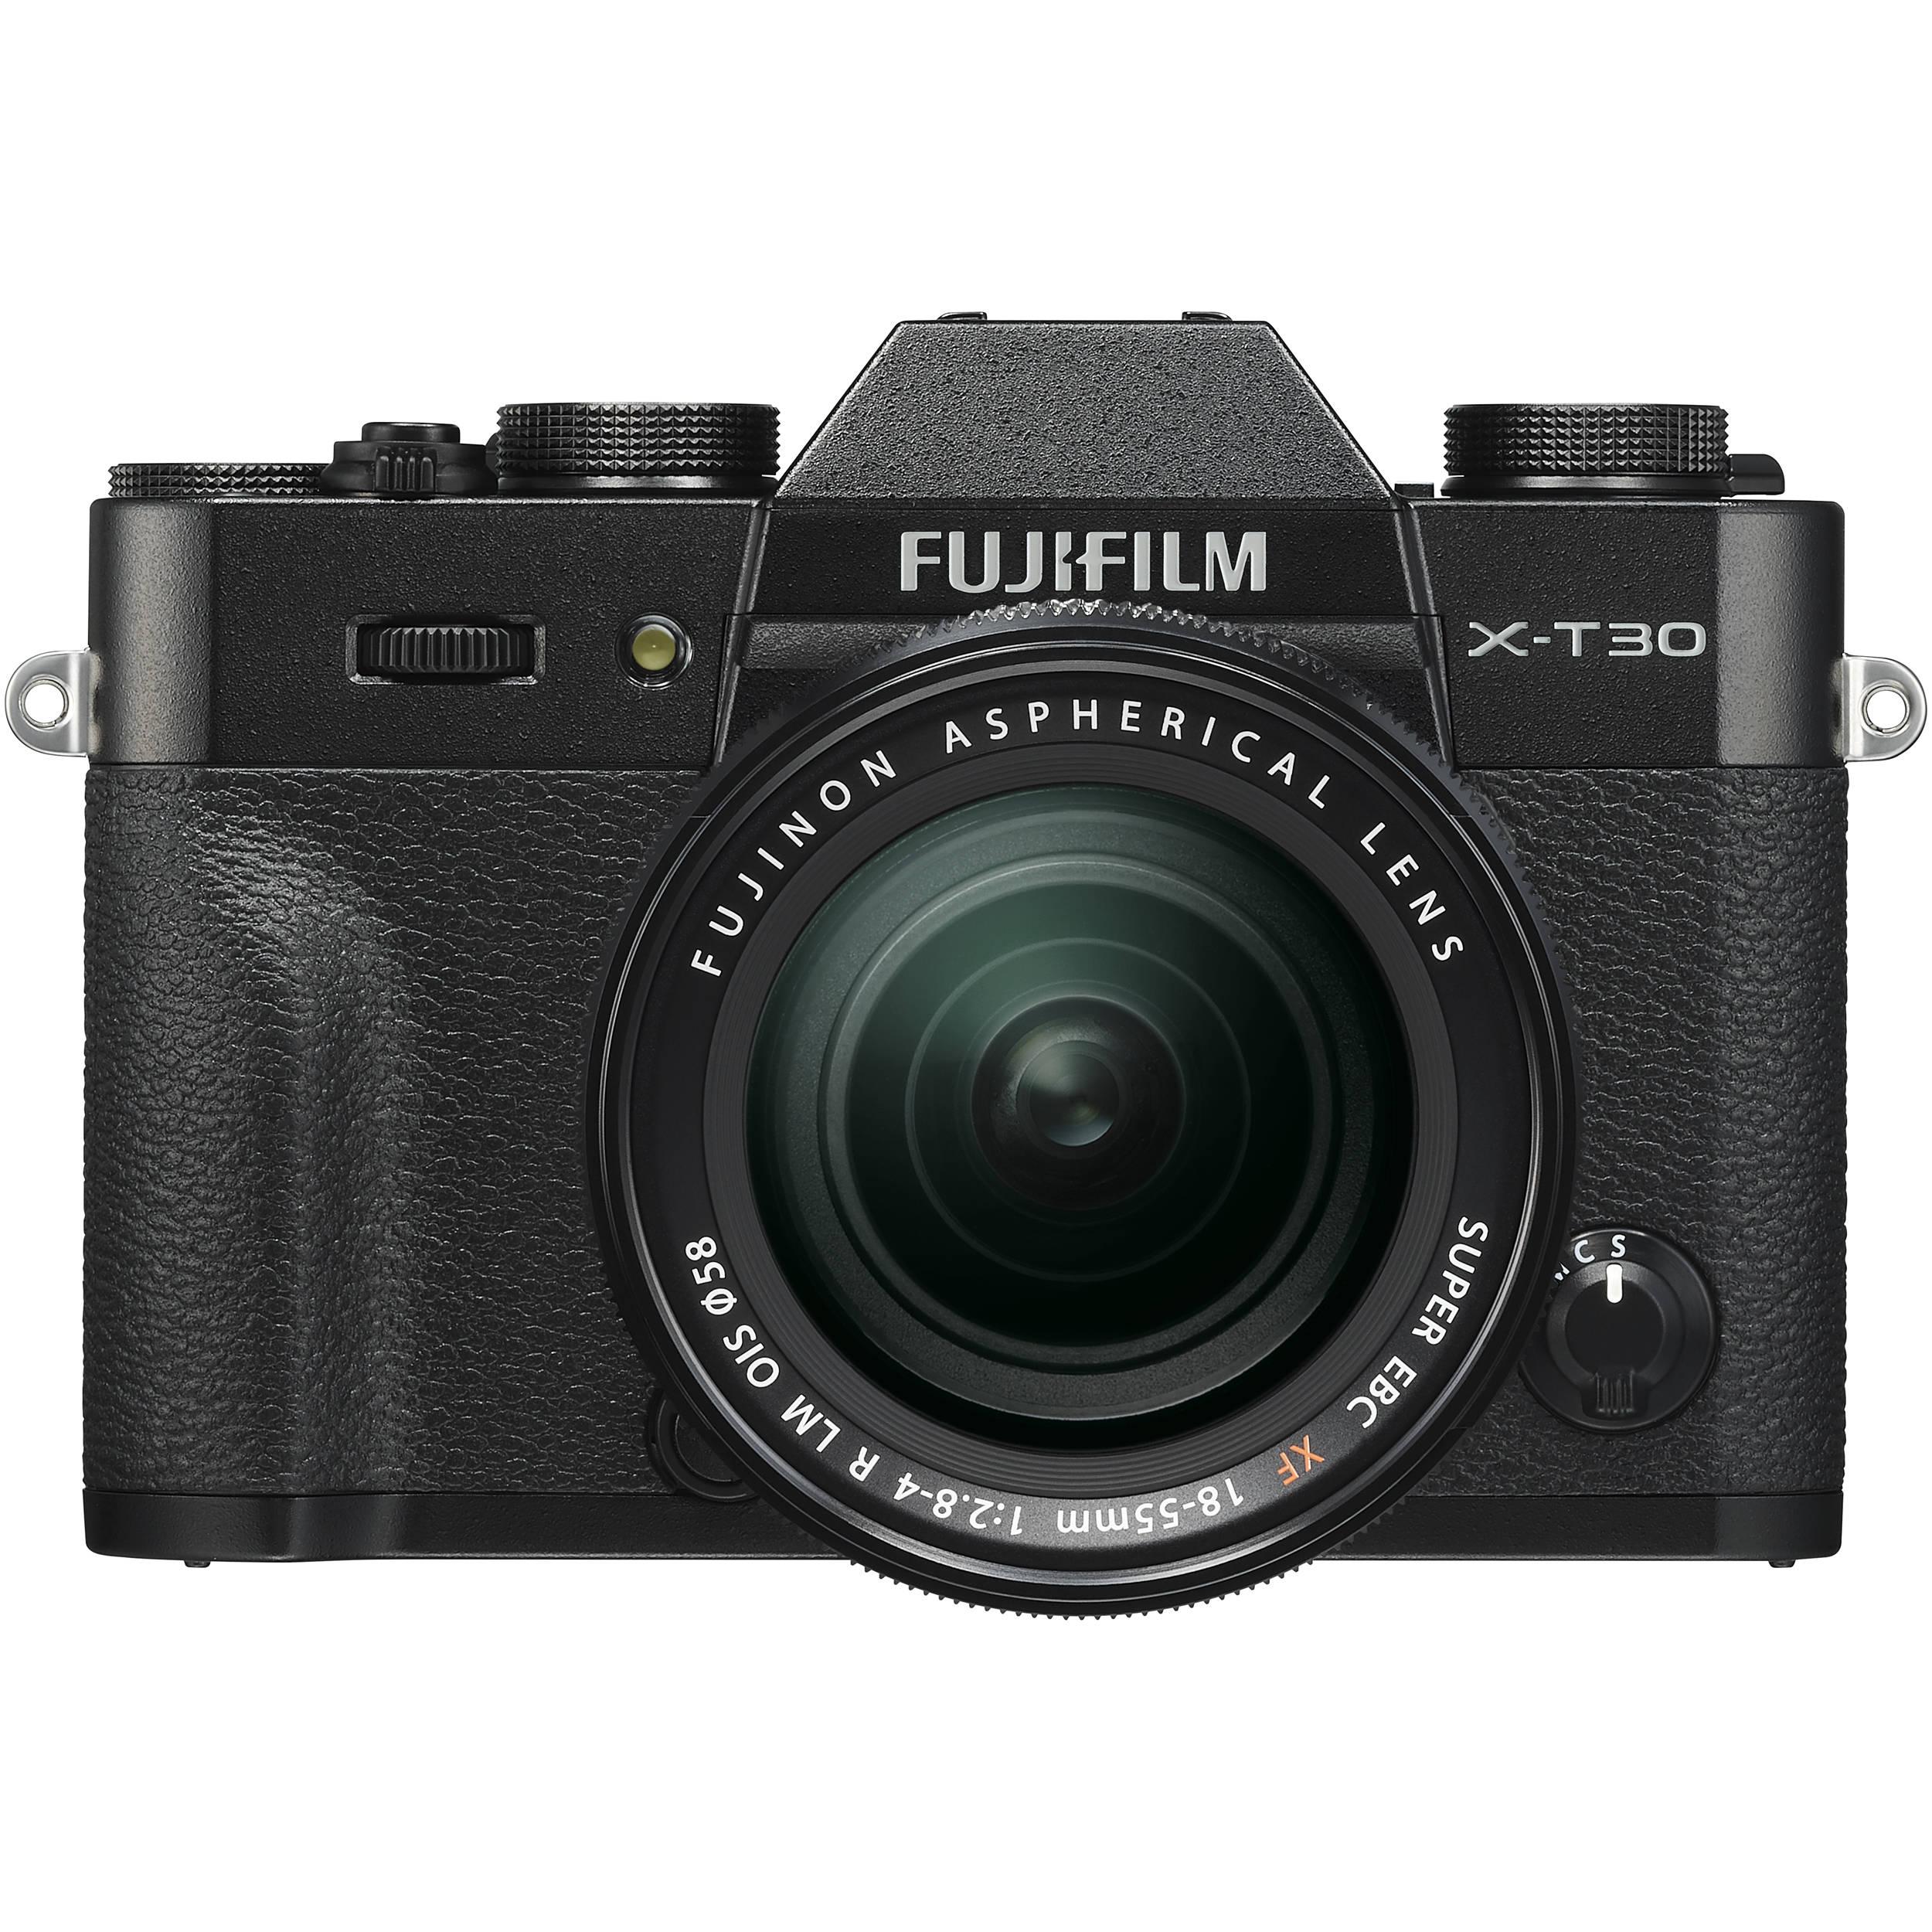 Fuji X Wedding Photography: FUJIFILM X-T30 Mirrorless Digital Camera With 18-55mm 16619920